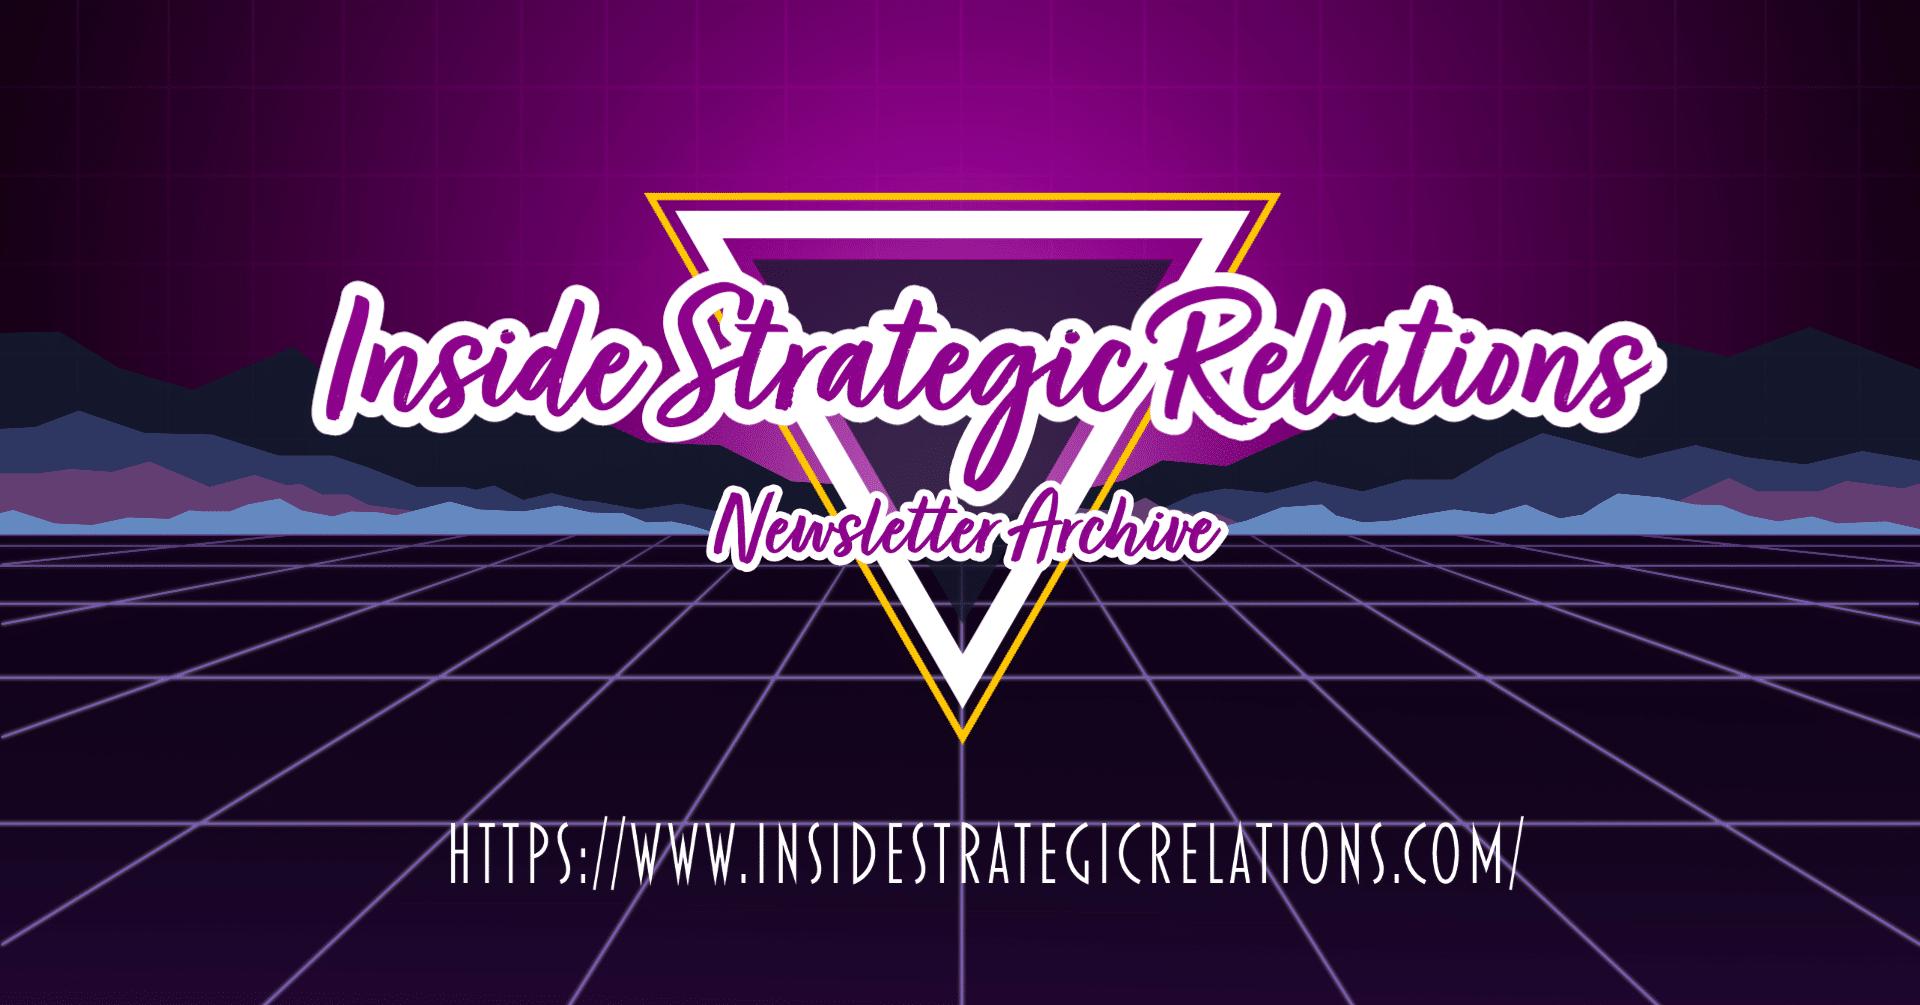 80's style, Inside Strategic Relations Newsletter Archive